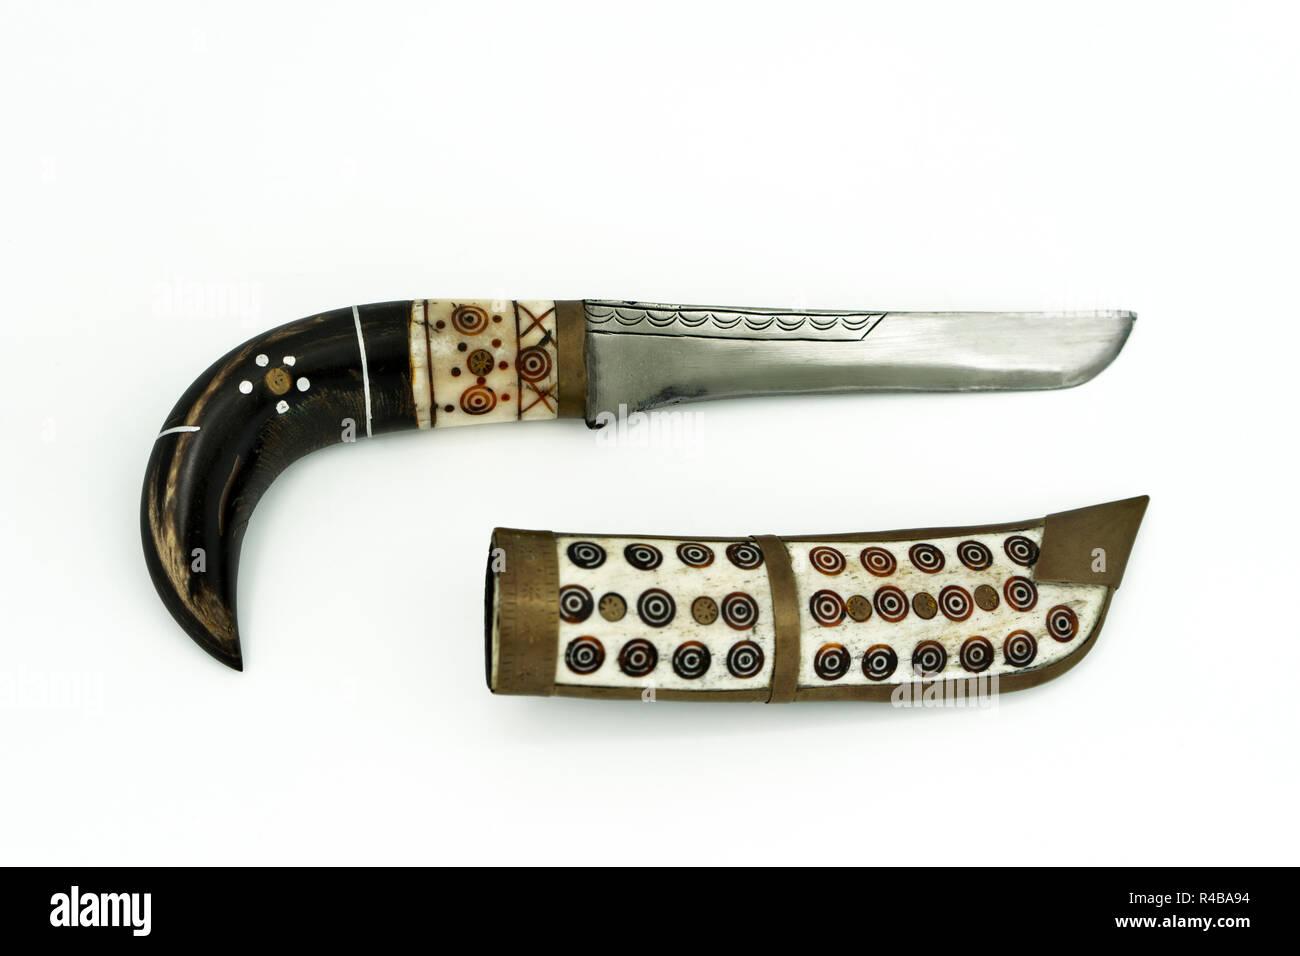 Thibetan knife - Stock Image